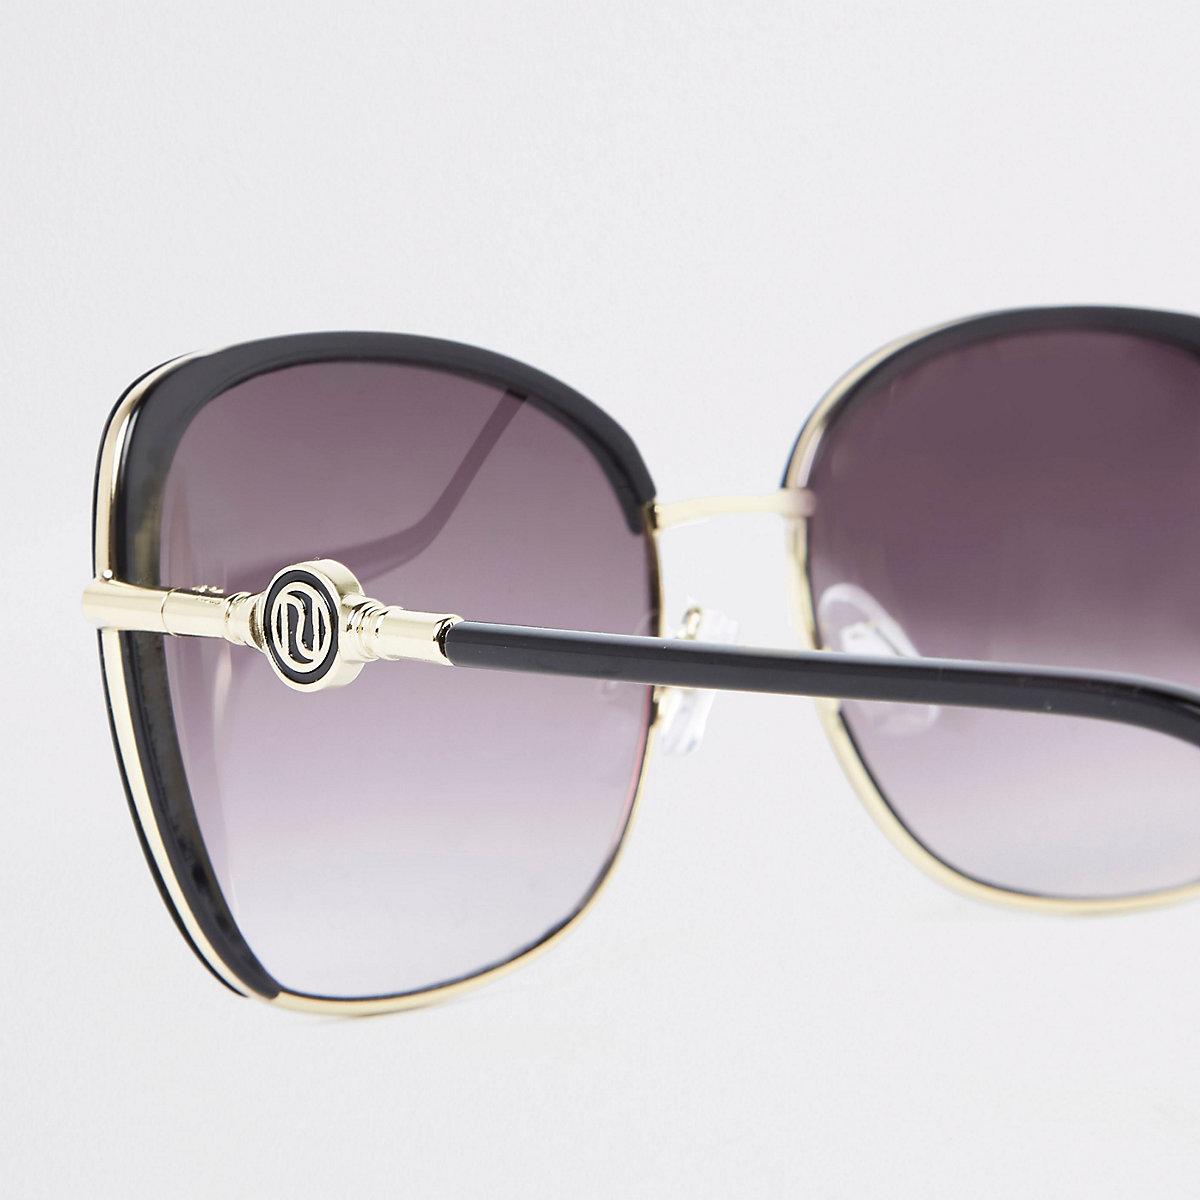 Black smoke lens glam sunglasses - Oversized Sunglasses - Sunglasses ... fda1d338ef